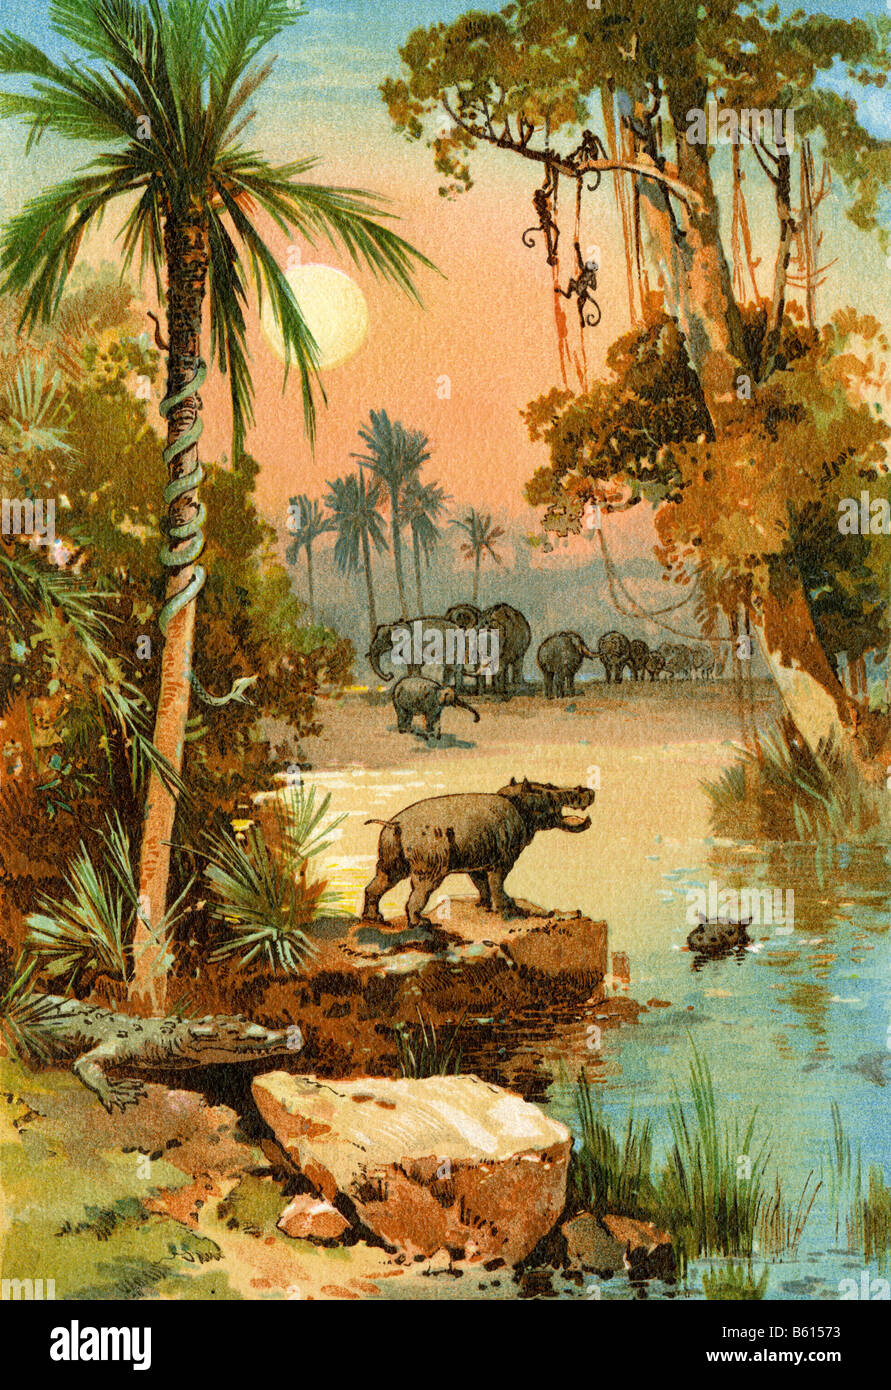 Elephants and hippopotamus along the Congo River Stock Photo